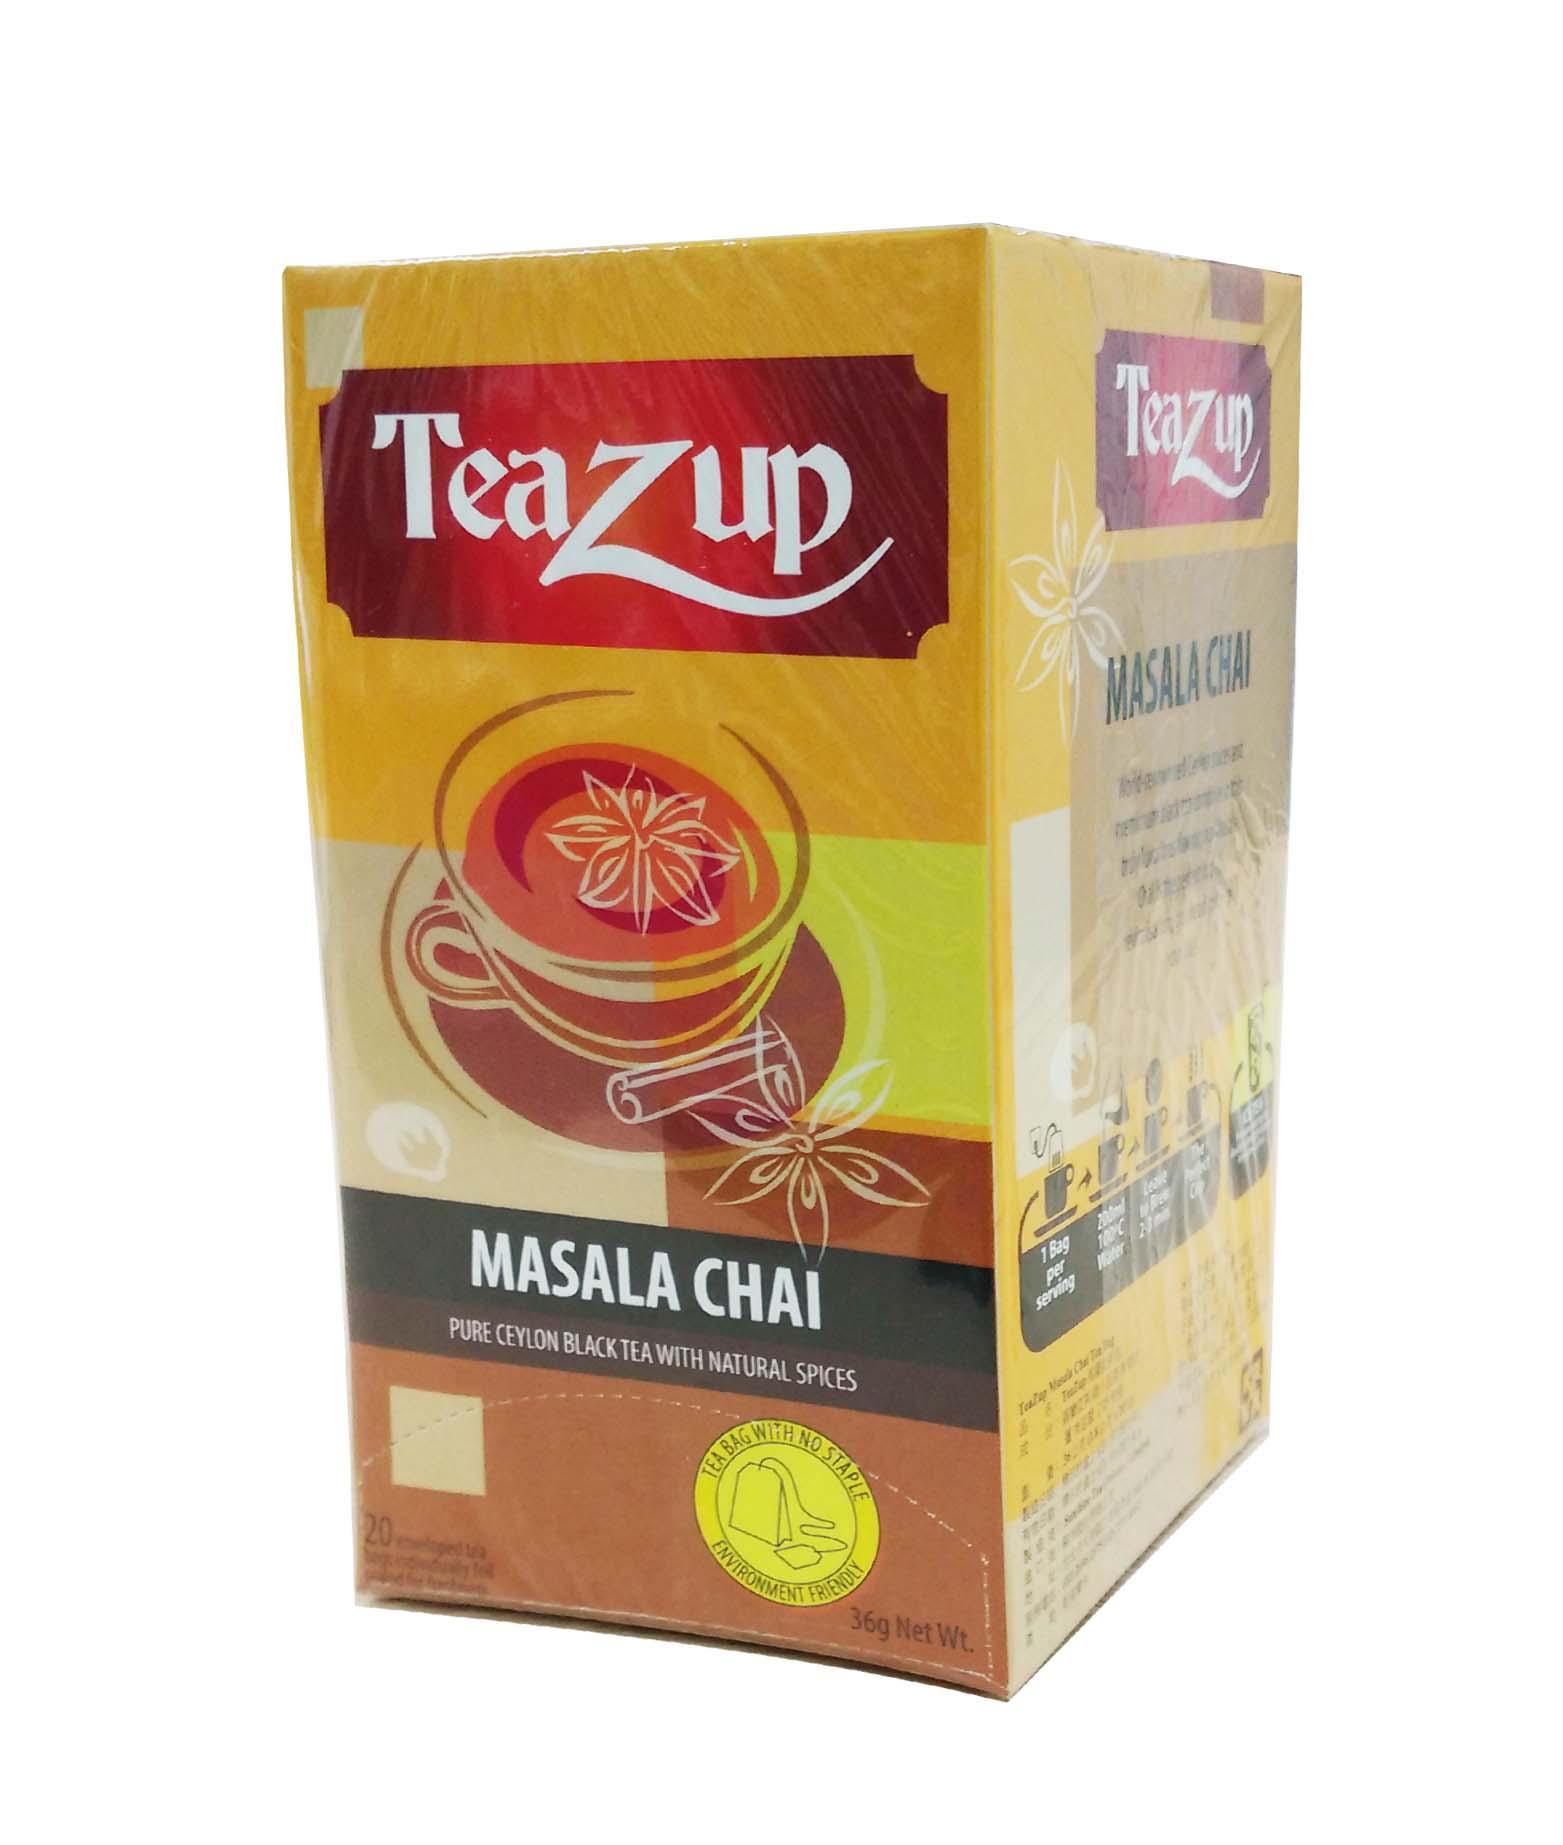 TeaZup Masala Chai Tea Bag  TeaZup馬薩拉茶包